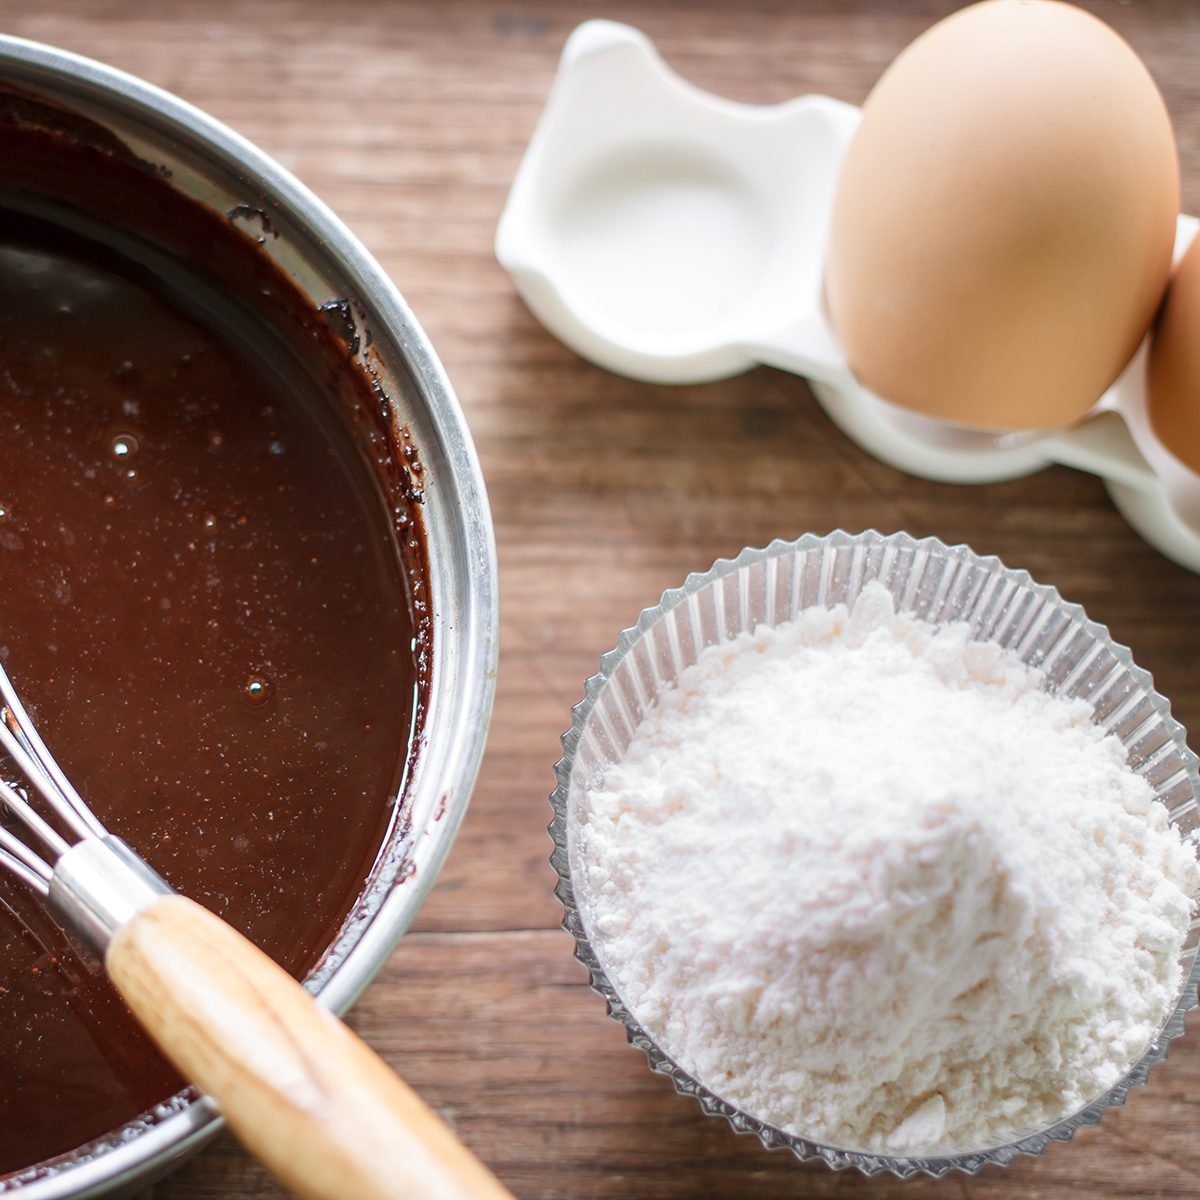 mixed yolk eggs, flour and sugar prepare for baking cake or bake